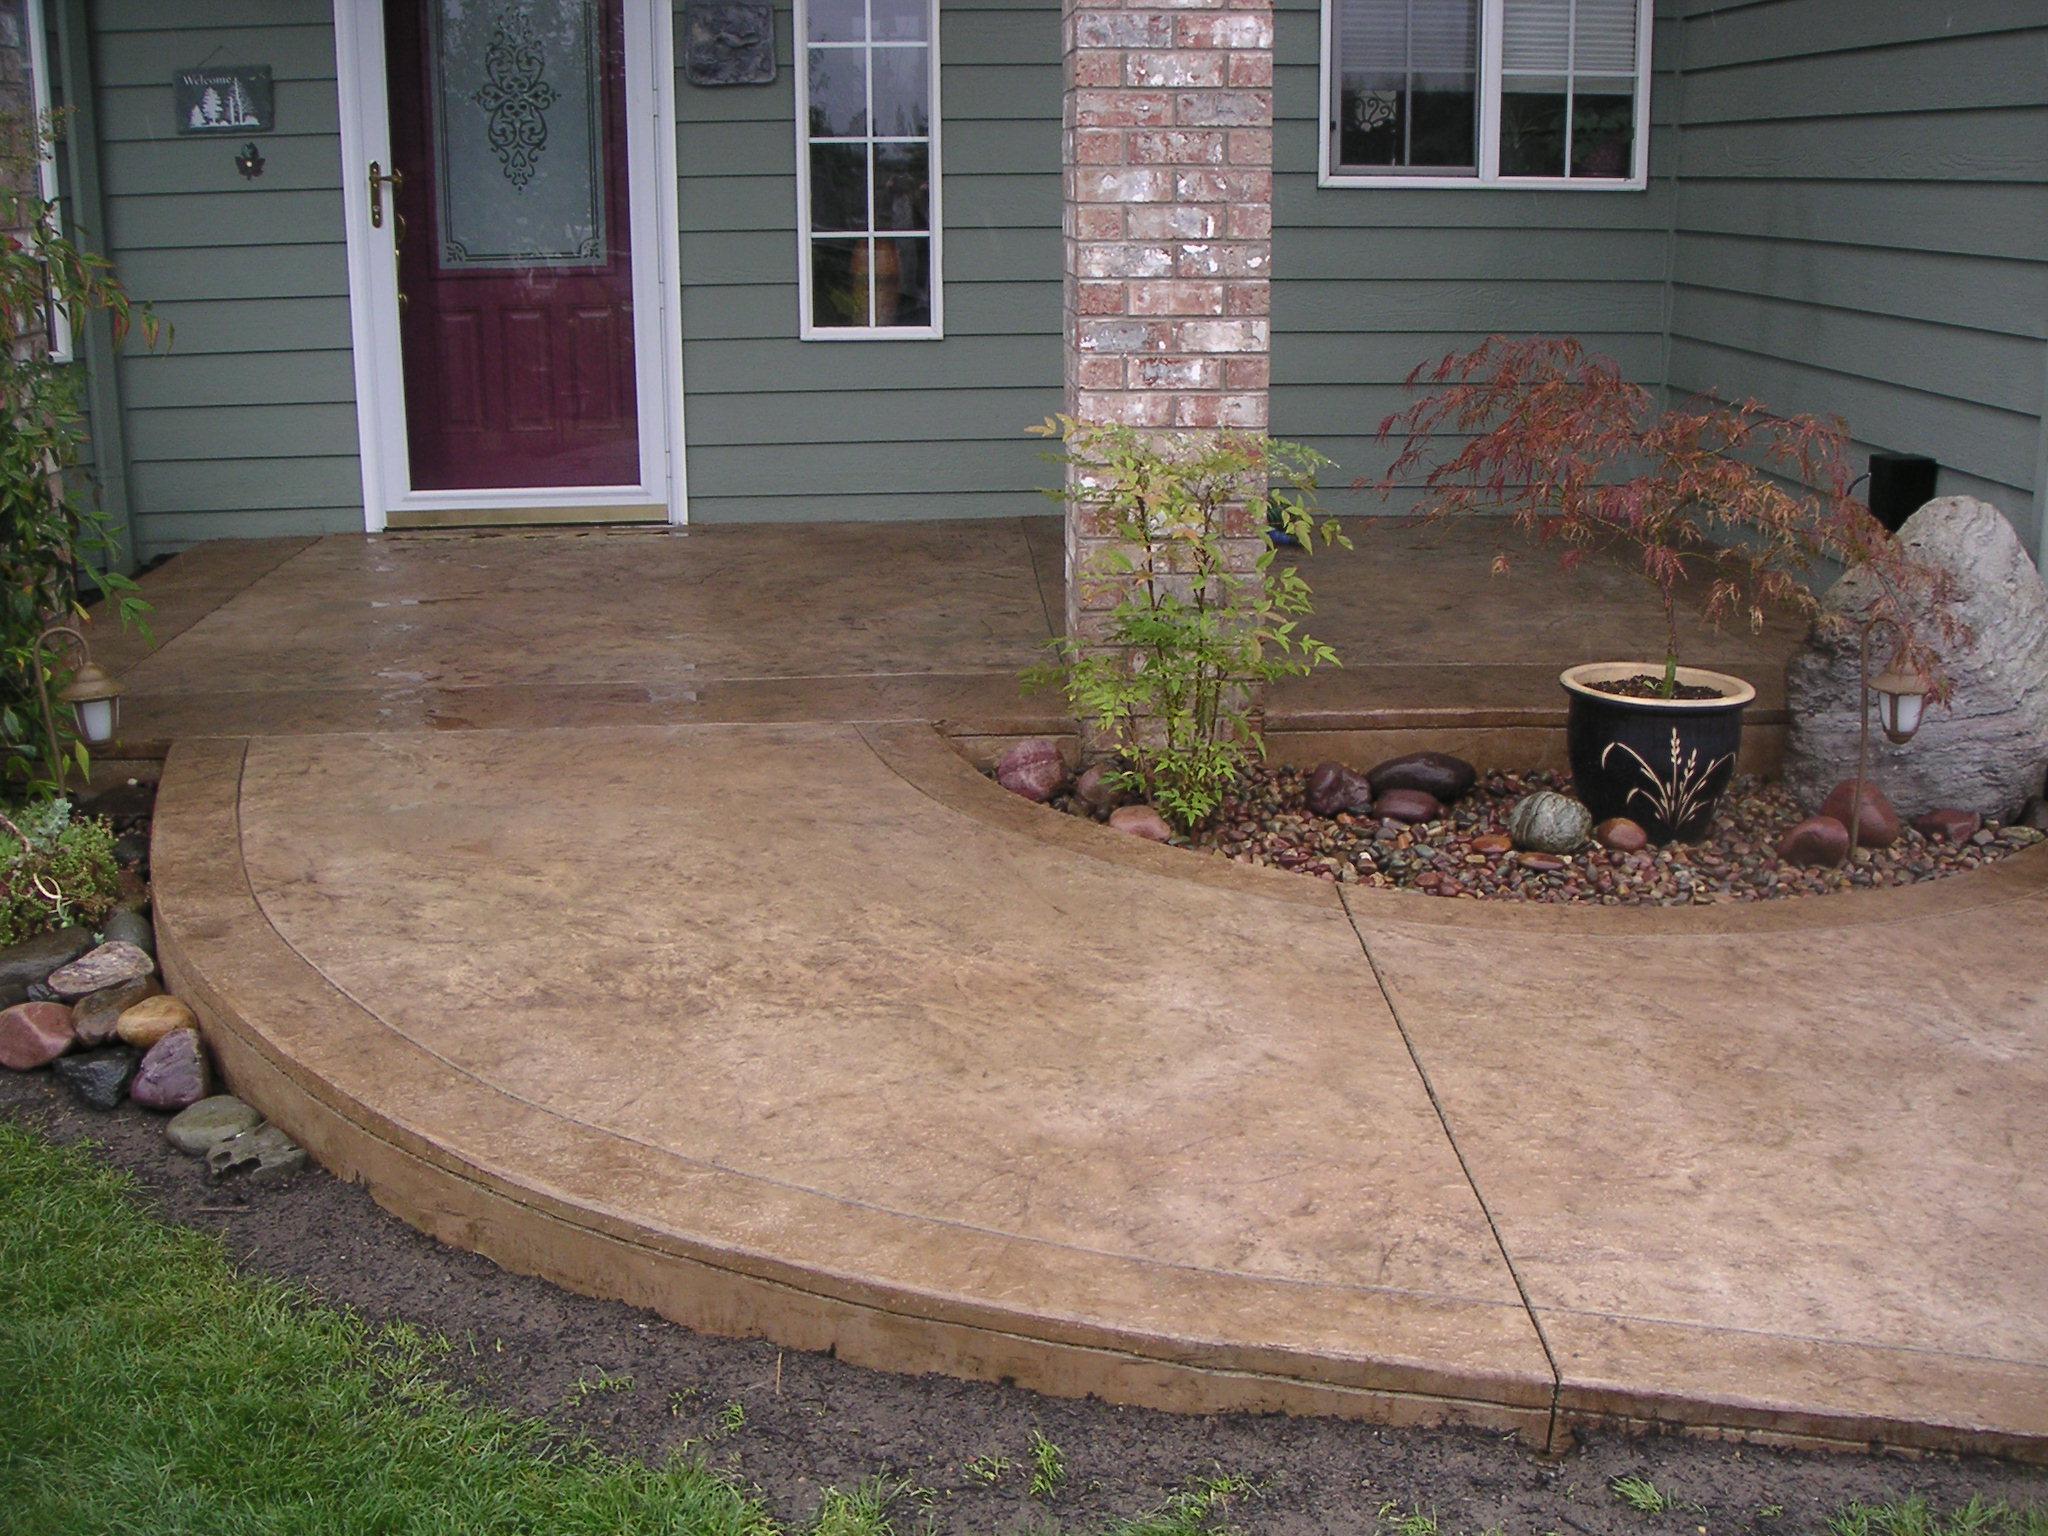 We Do Residential Concrete Work Masonry Work All Types